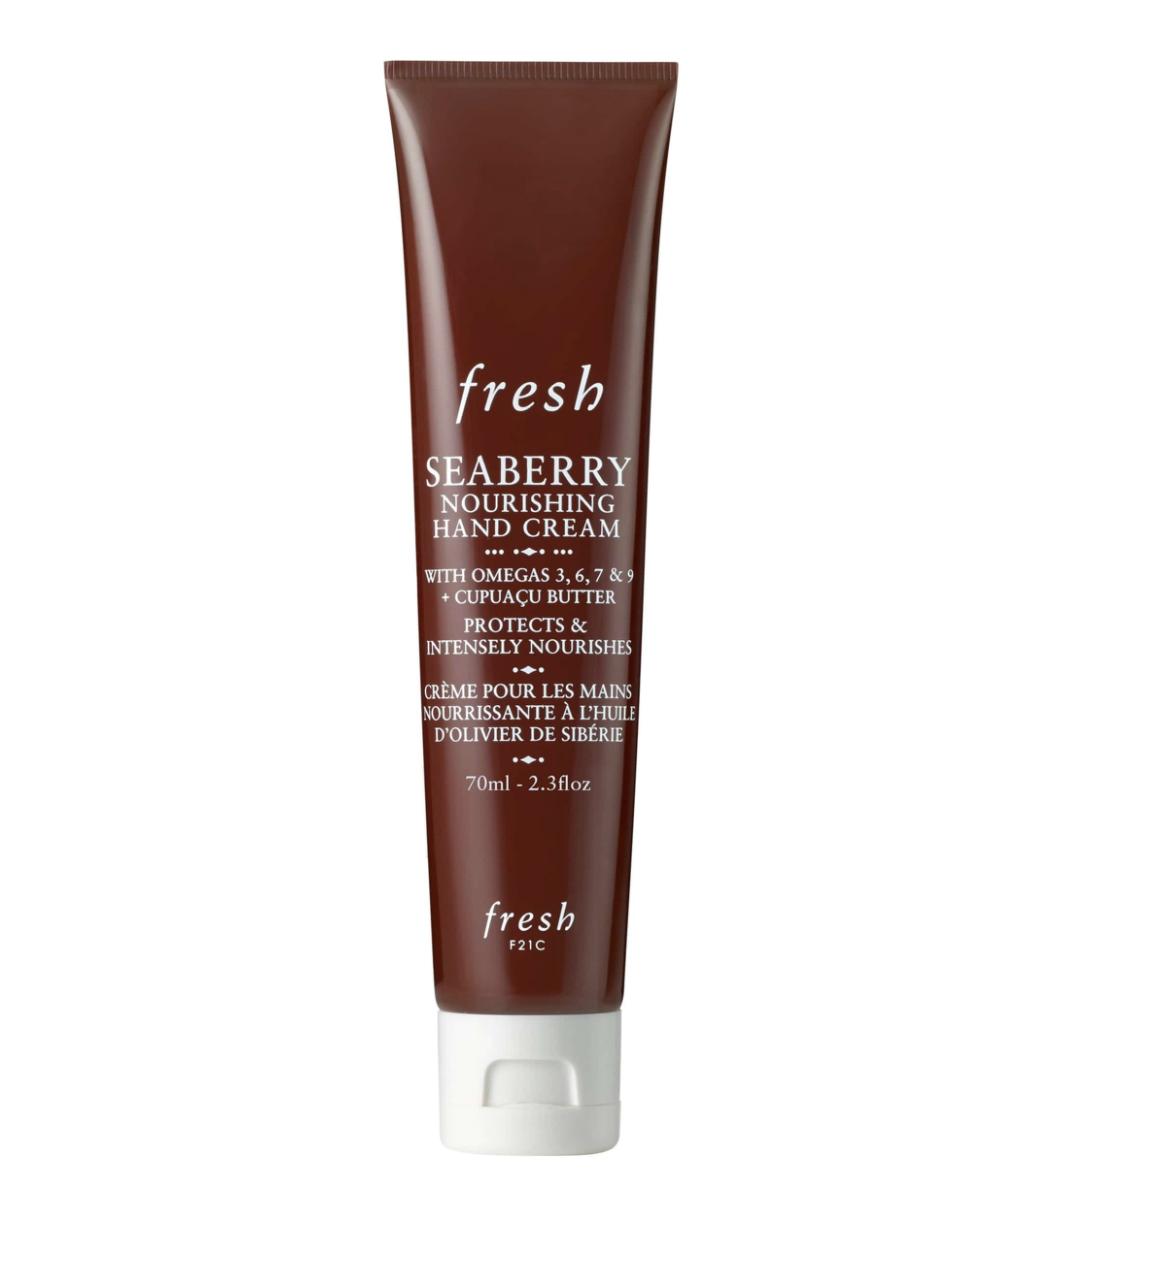 Fresh Seaberry Hand Cream